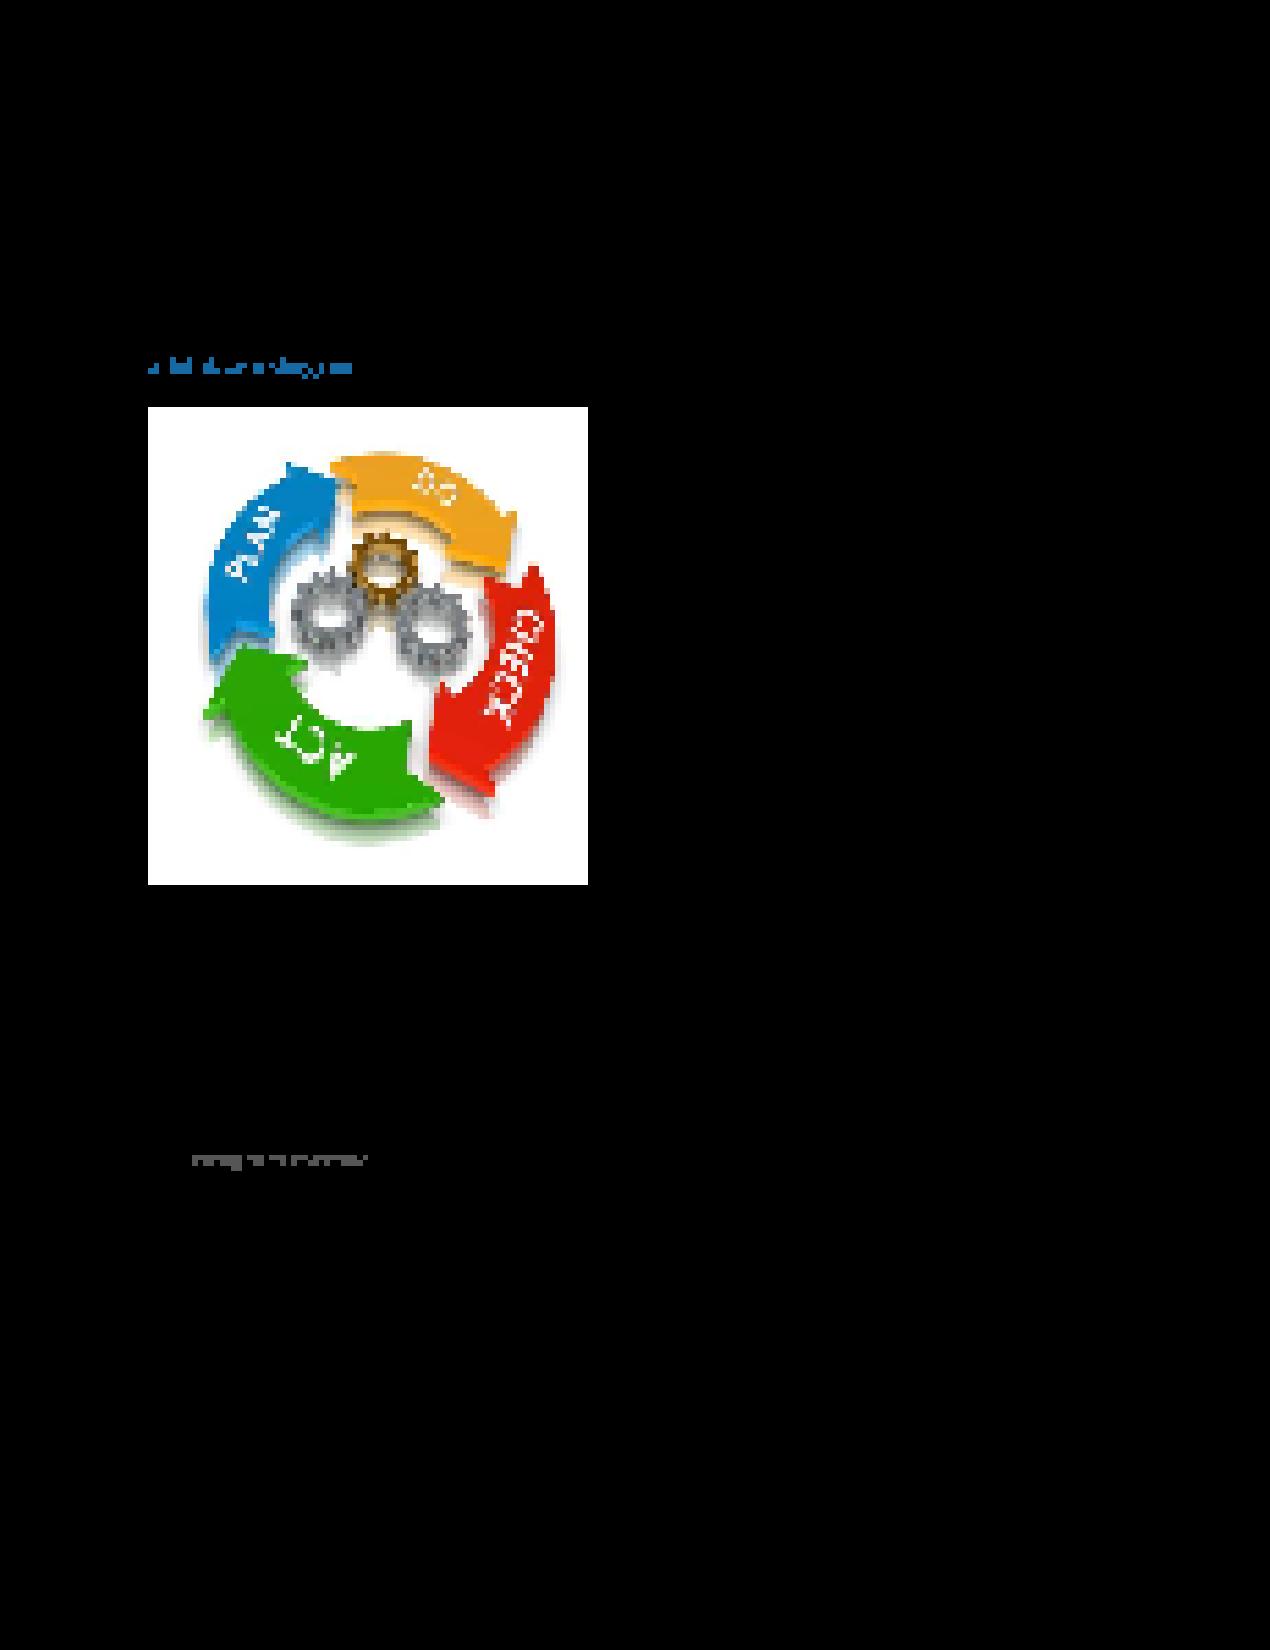 docx to high quality pdf